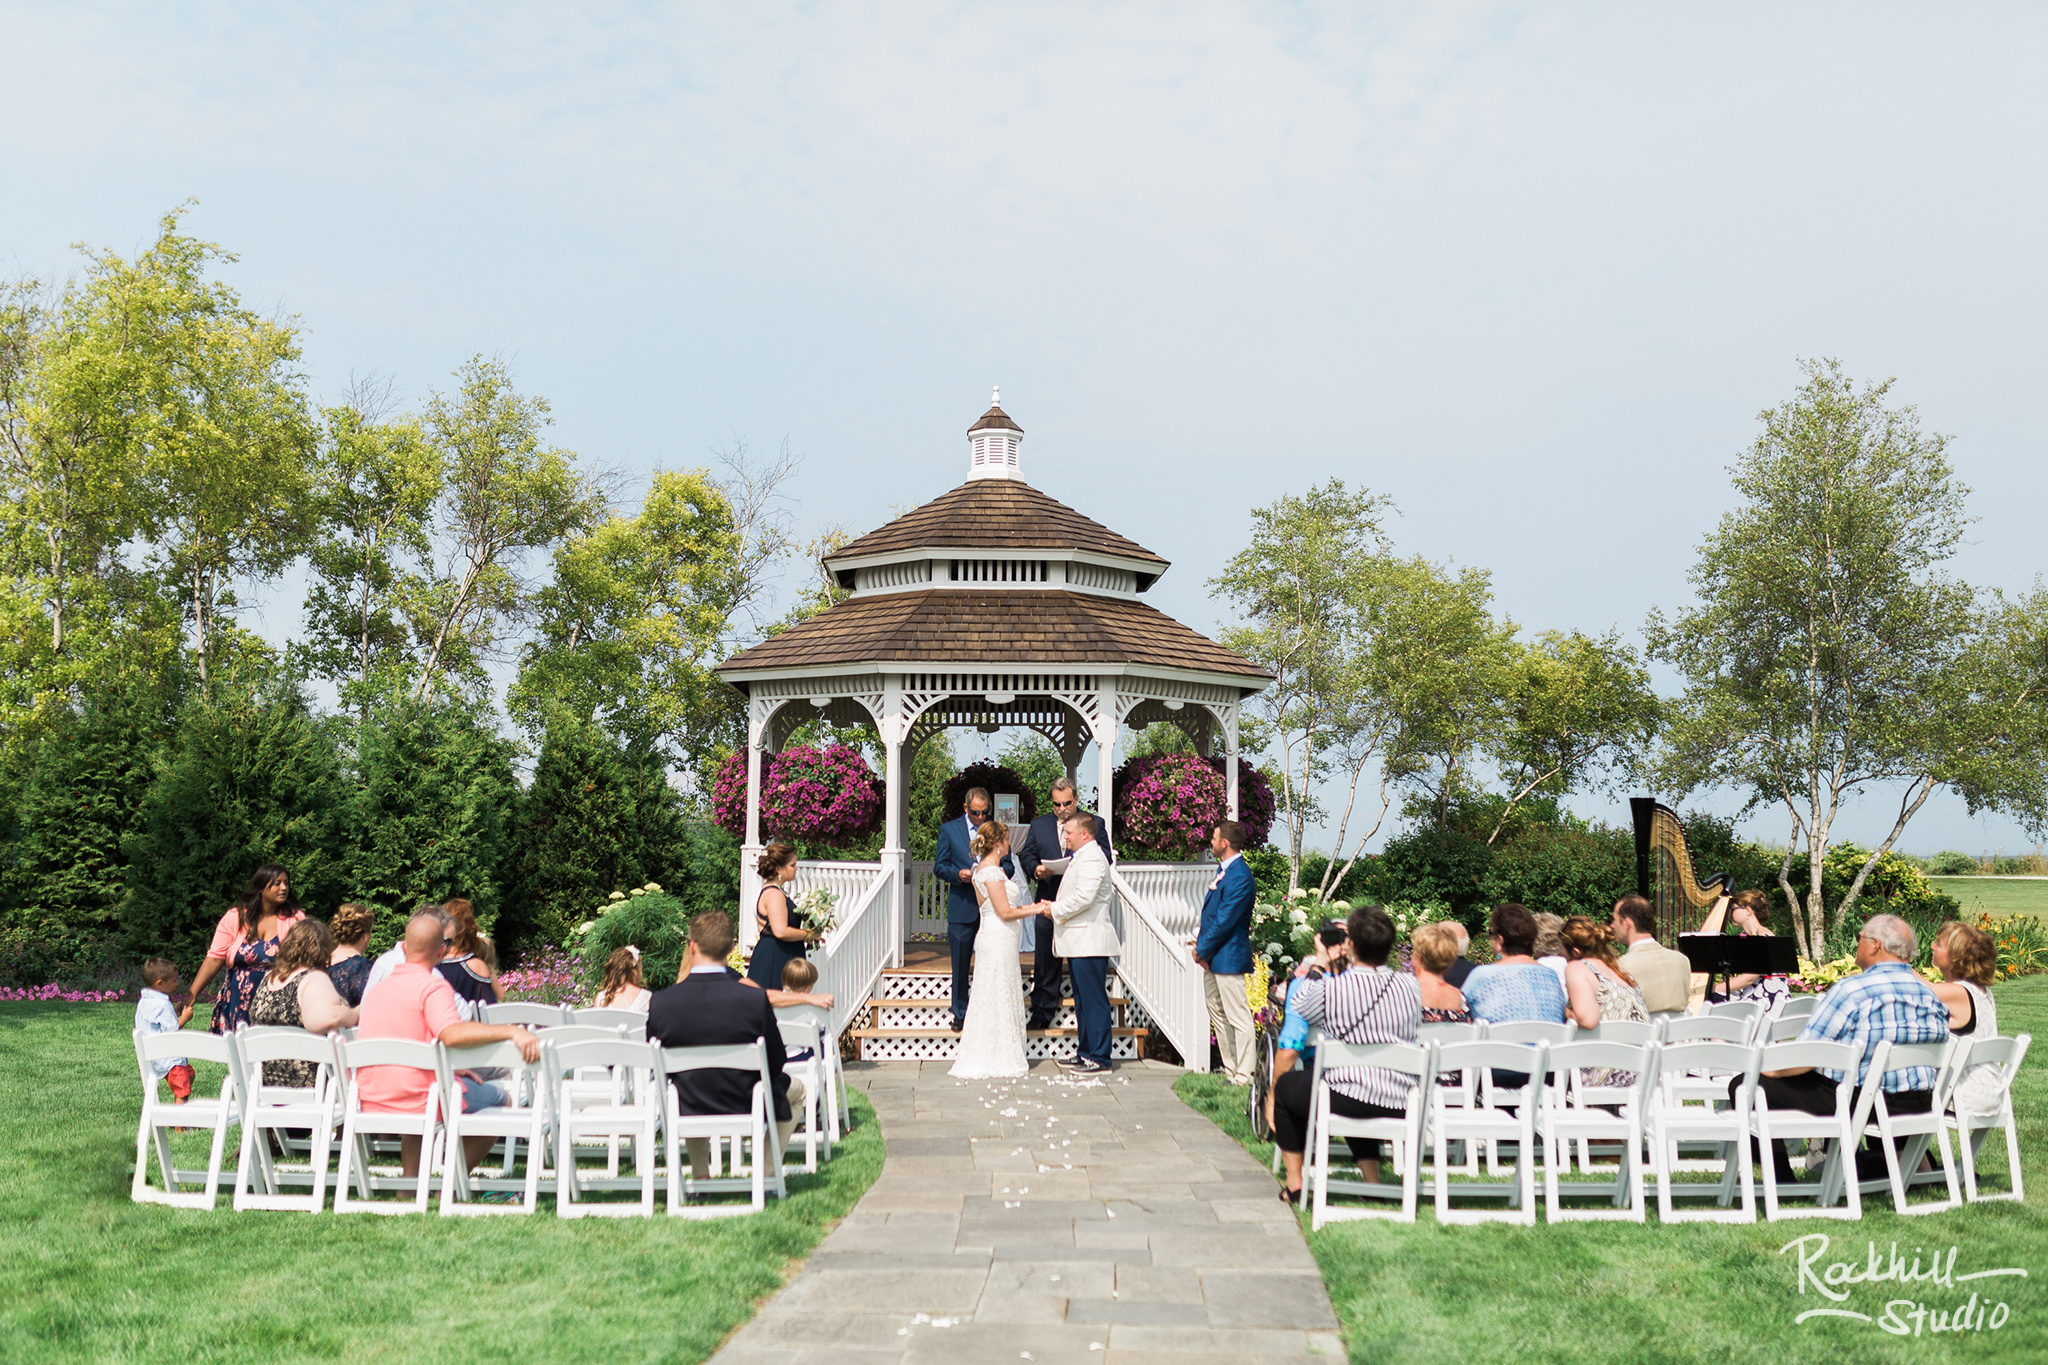 Mission Point Wedding, gazebo, Traverse City Wedding Photographer Rockhill Studio